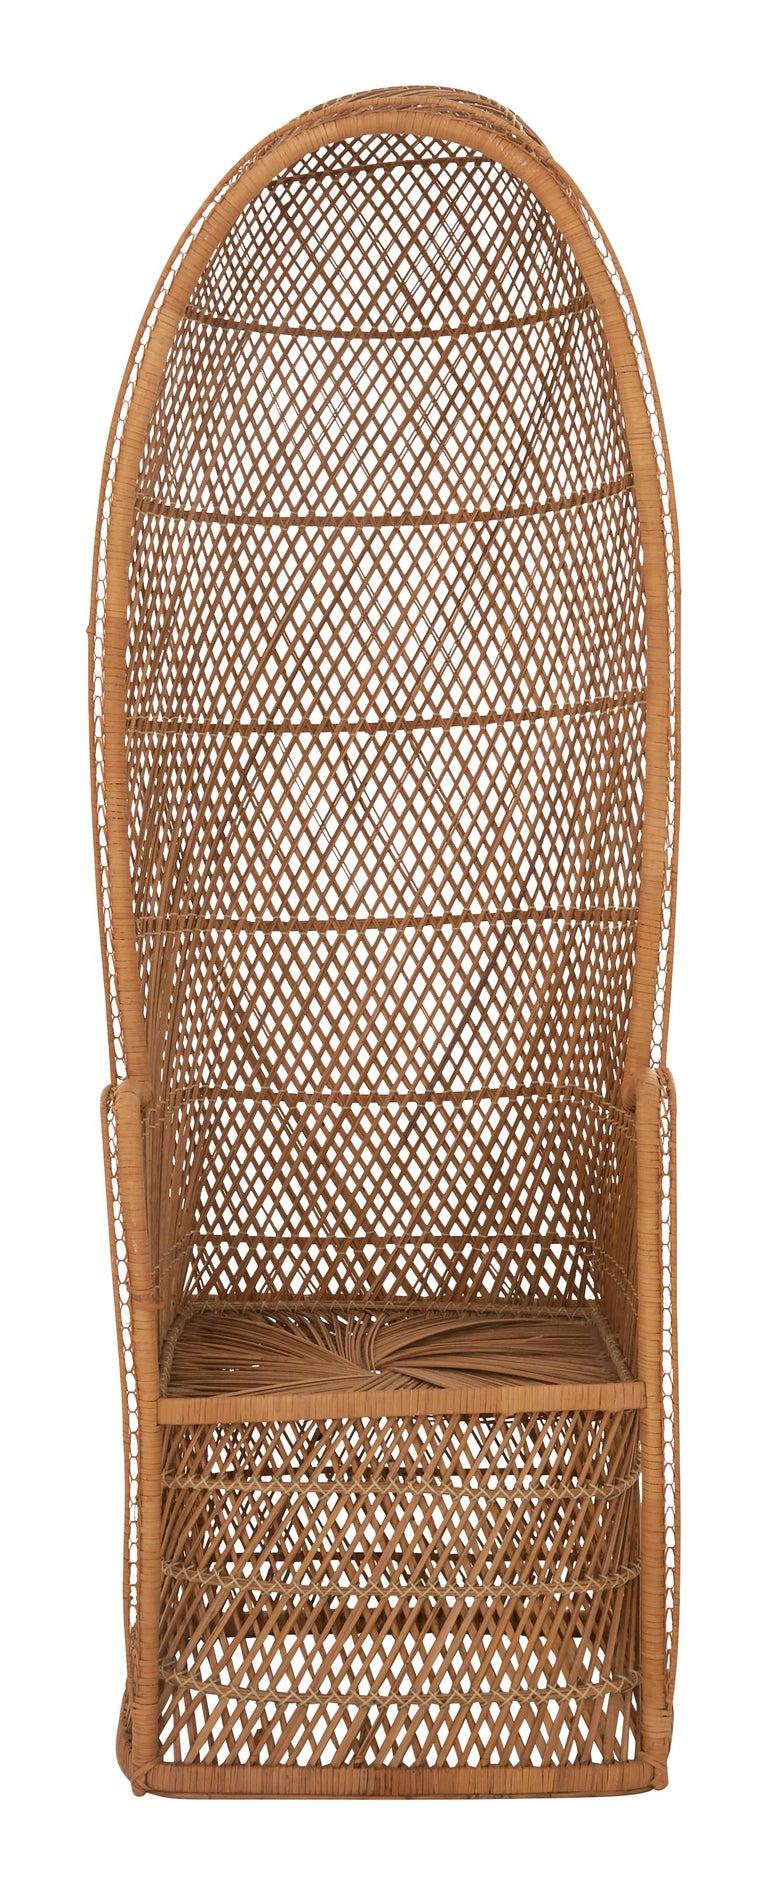 Mid-Century Modern Midcentury Hooded Rattan Armchair For Sale